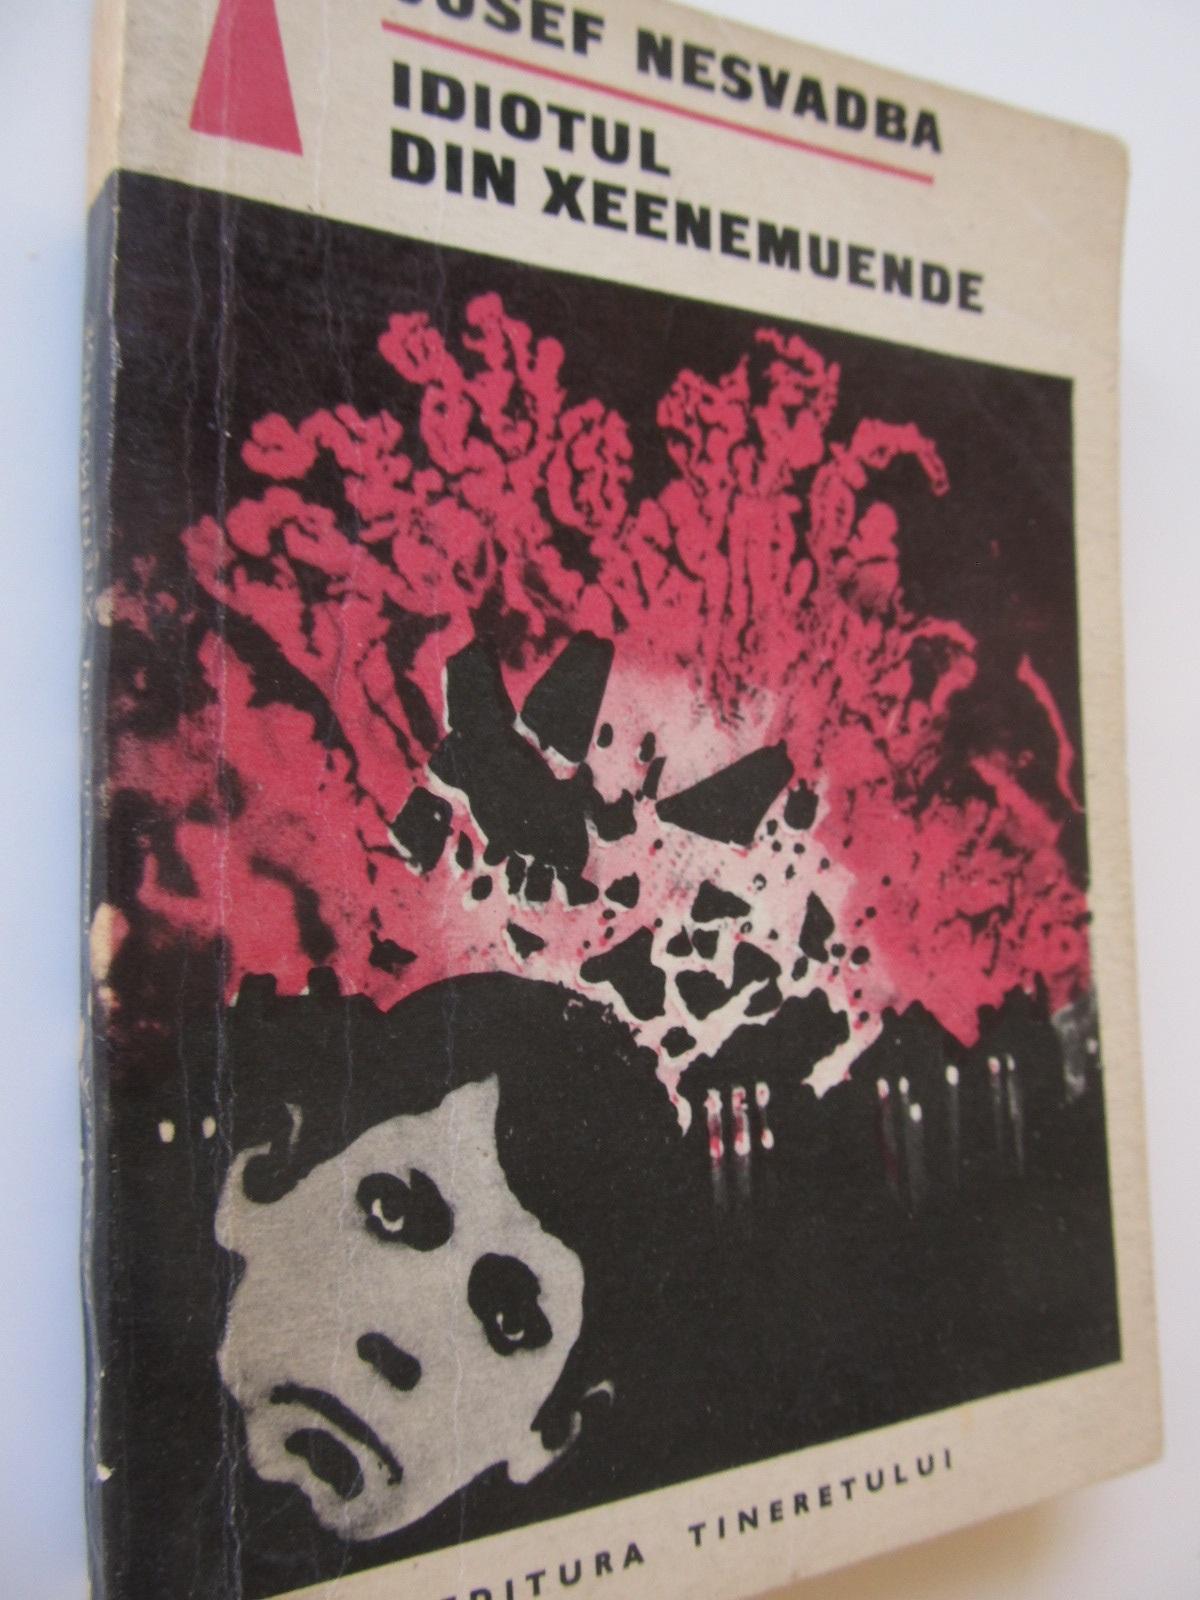 Idiotul din Xeenemuende - Josef Nesvadba | Detalii carte